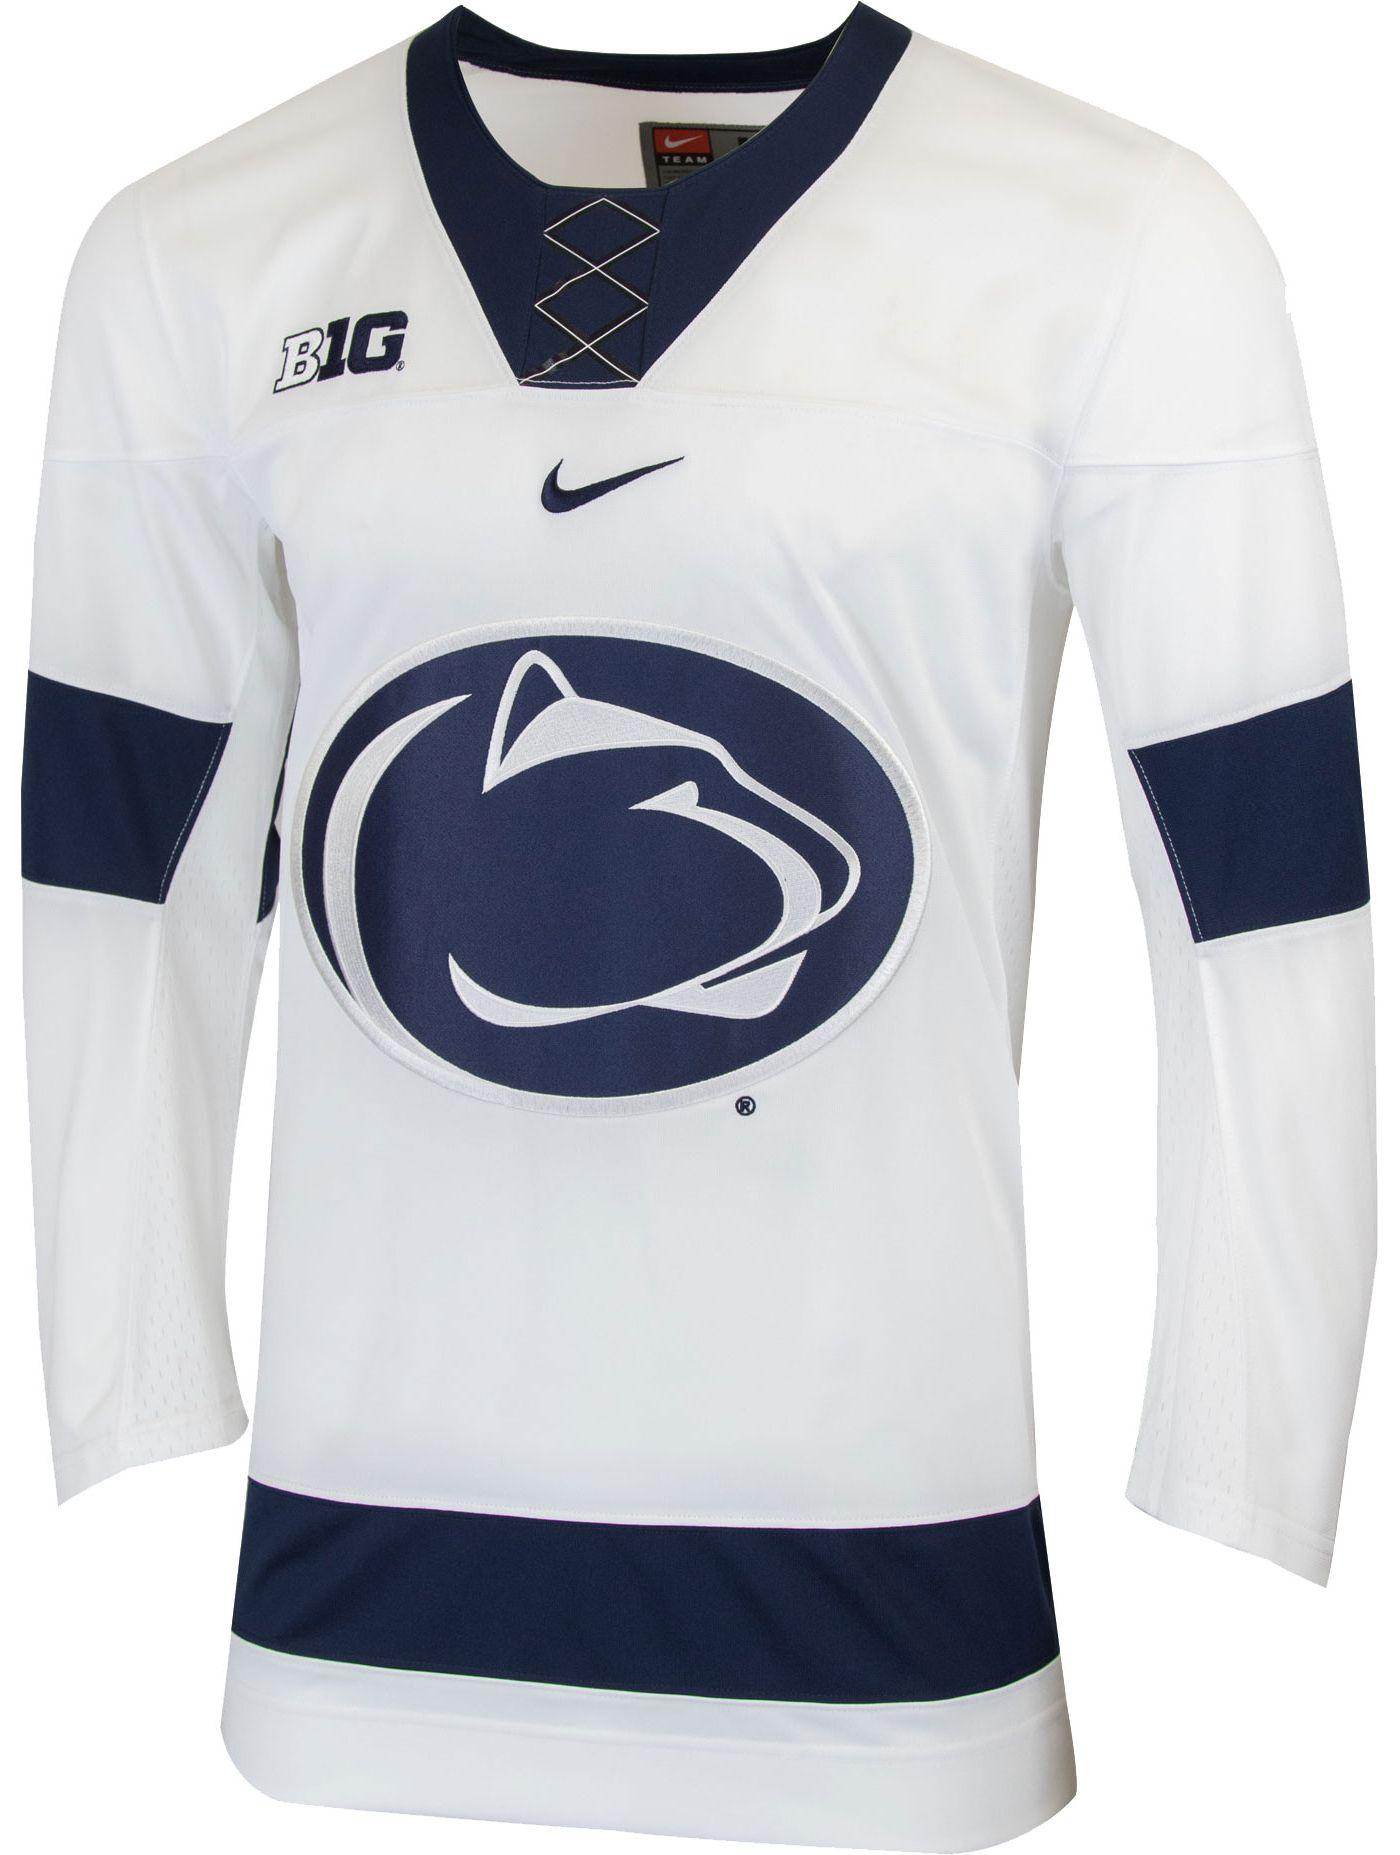 Nike Men's Penn State Nittany Lions Replica Hockey White Jersey